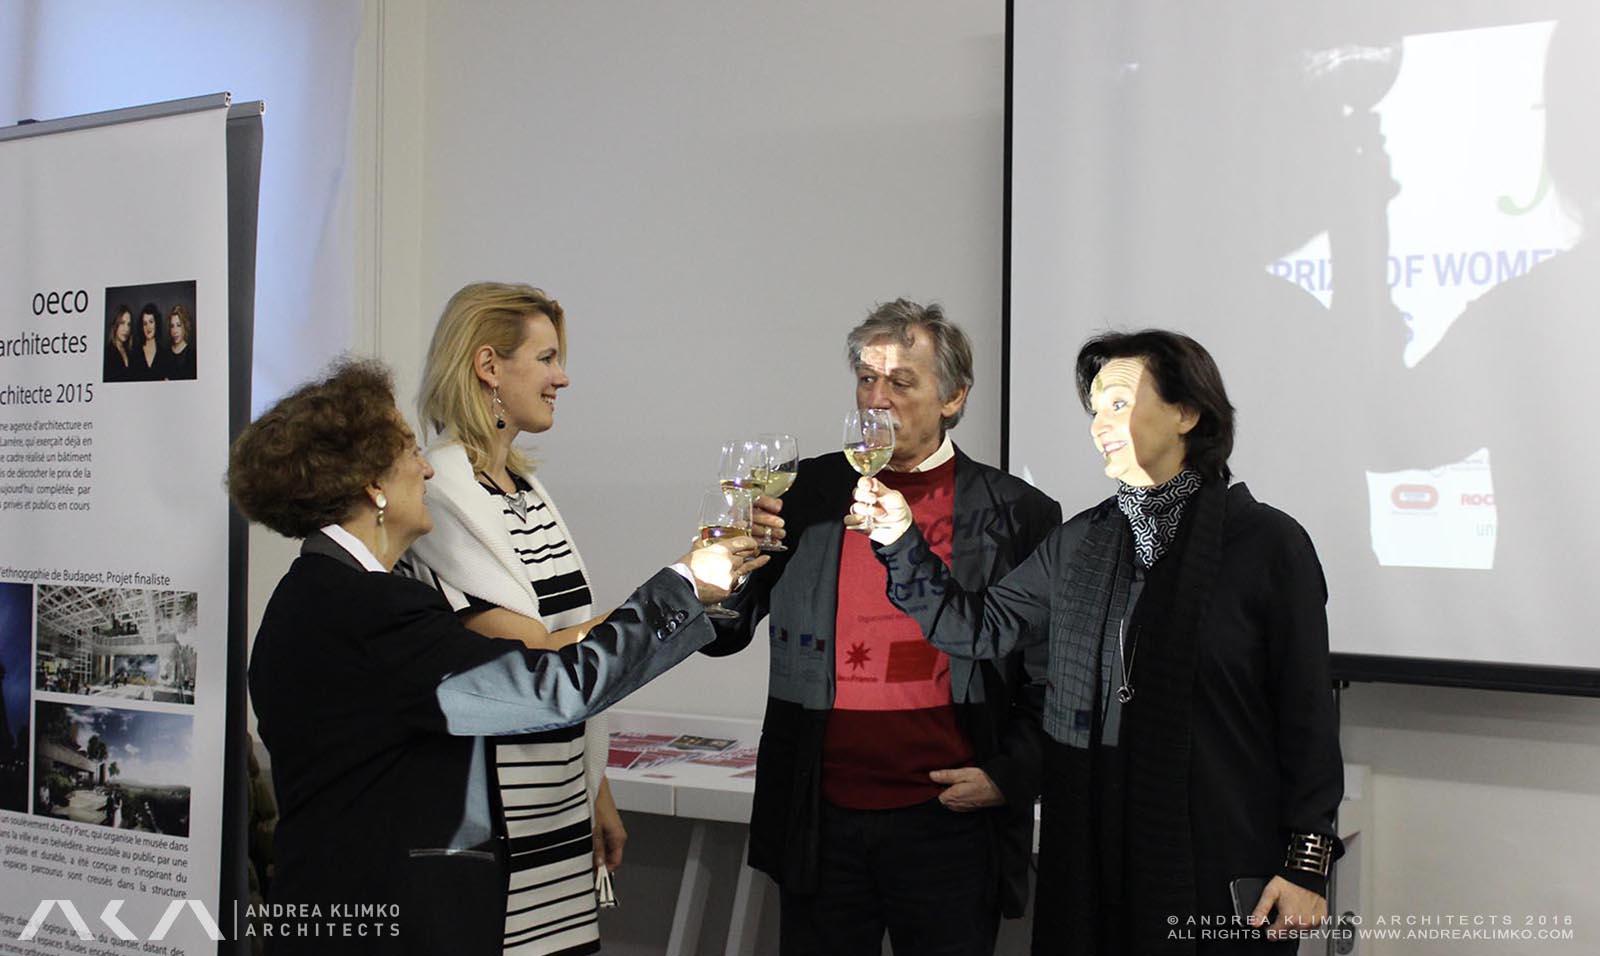 prix-des-femmes-architectes-on-display-in-bratislava_05